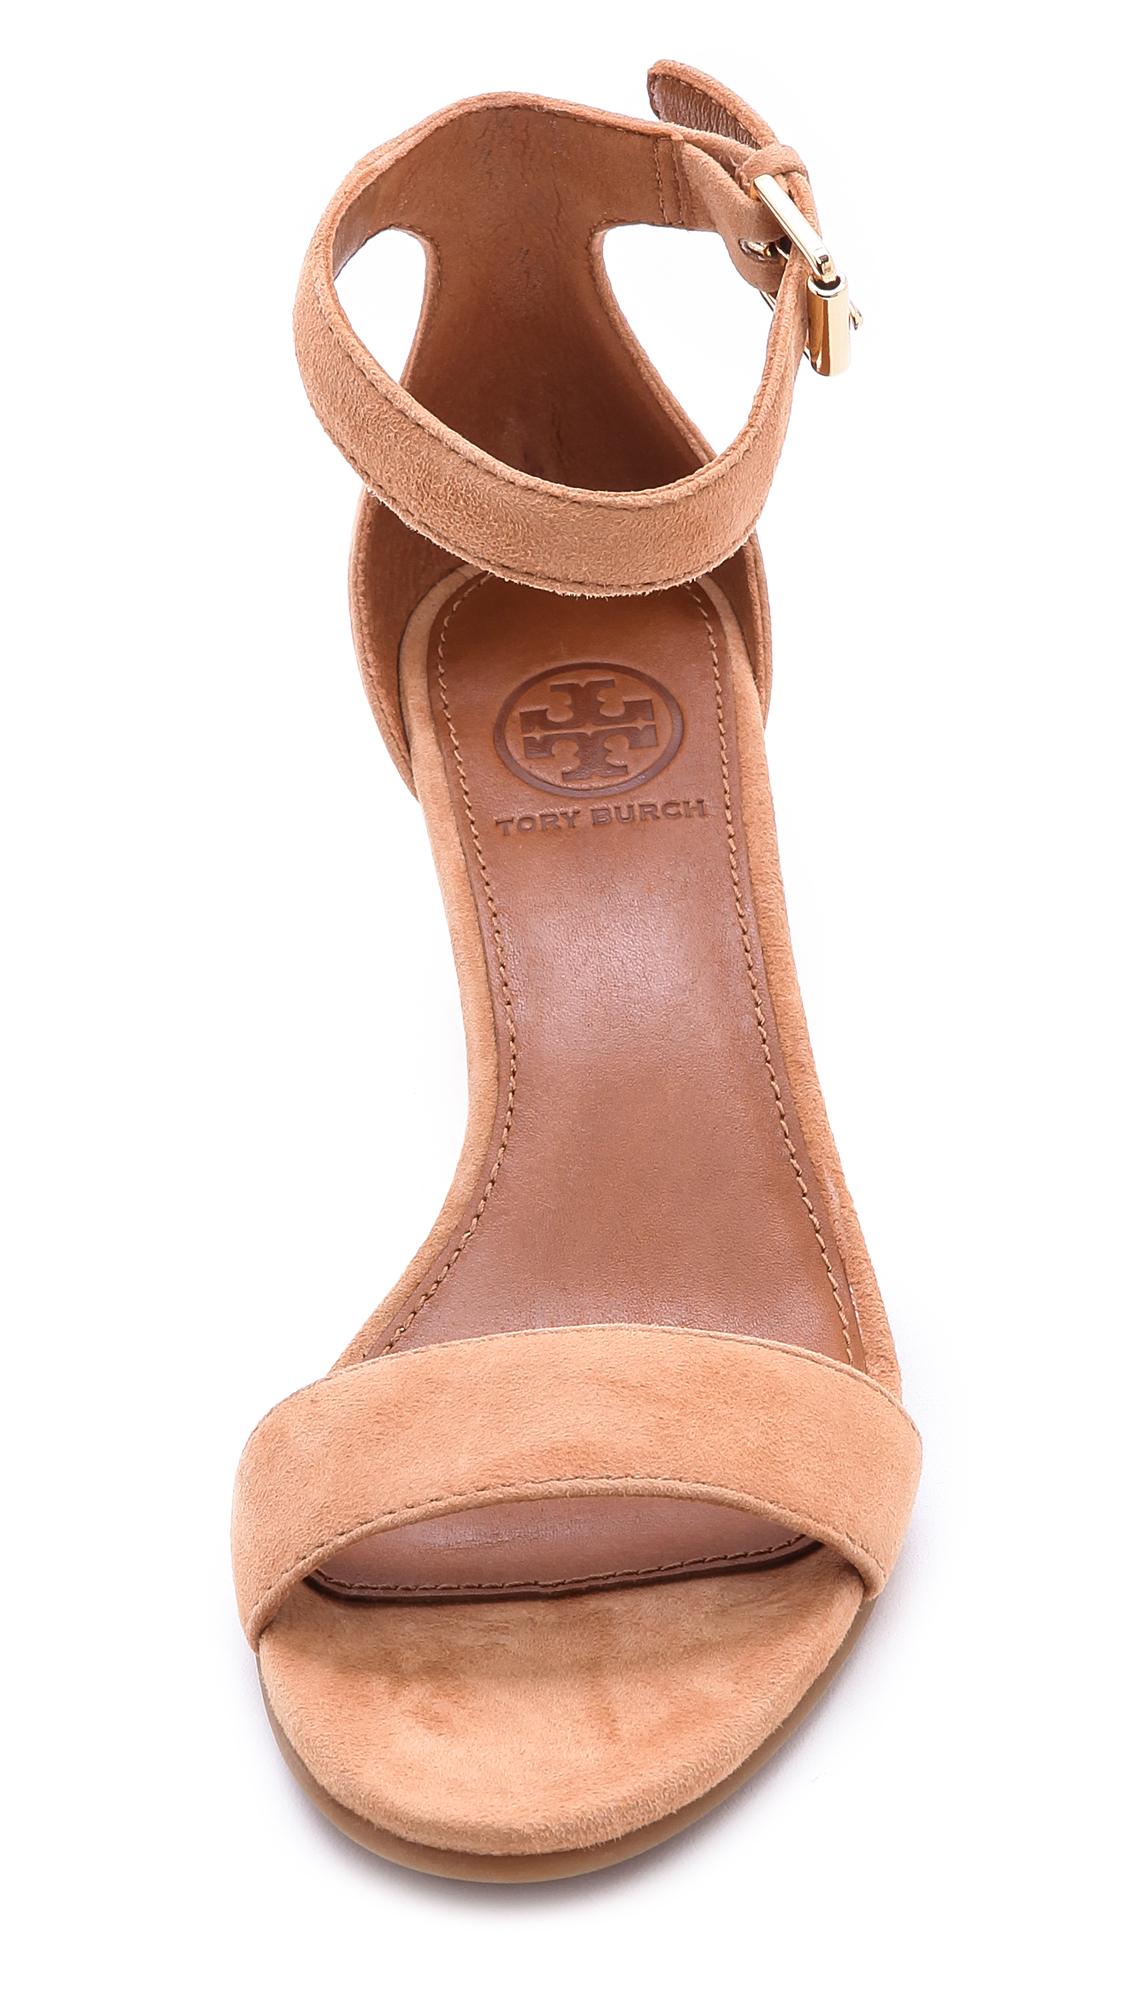 Tory Burch Savannah Wedge Sandals Carnival In Natural Lyst